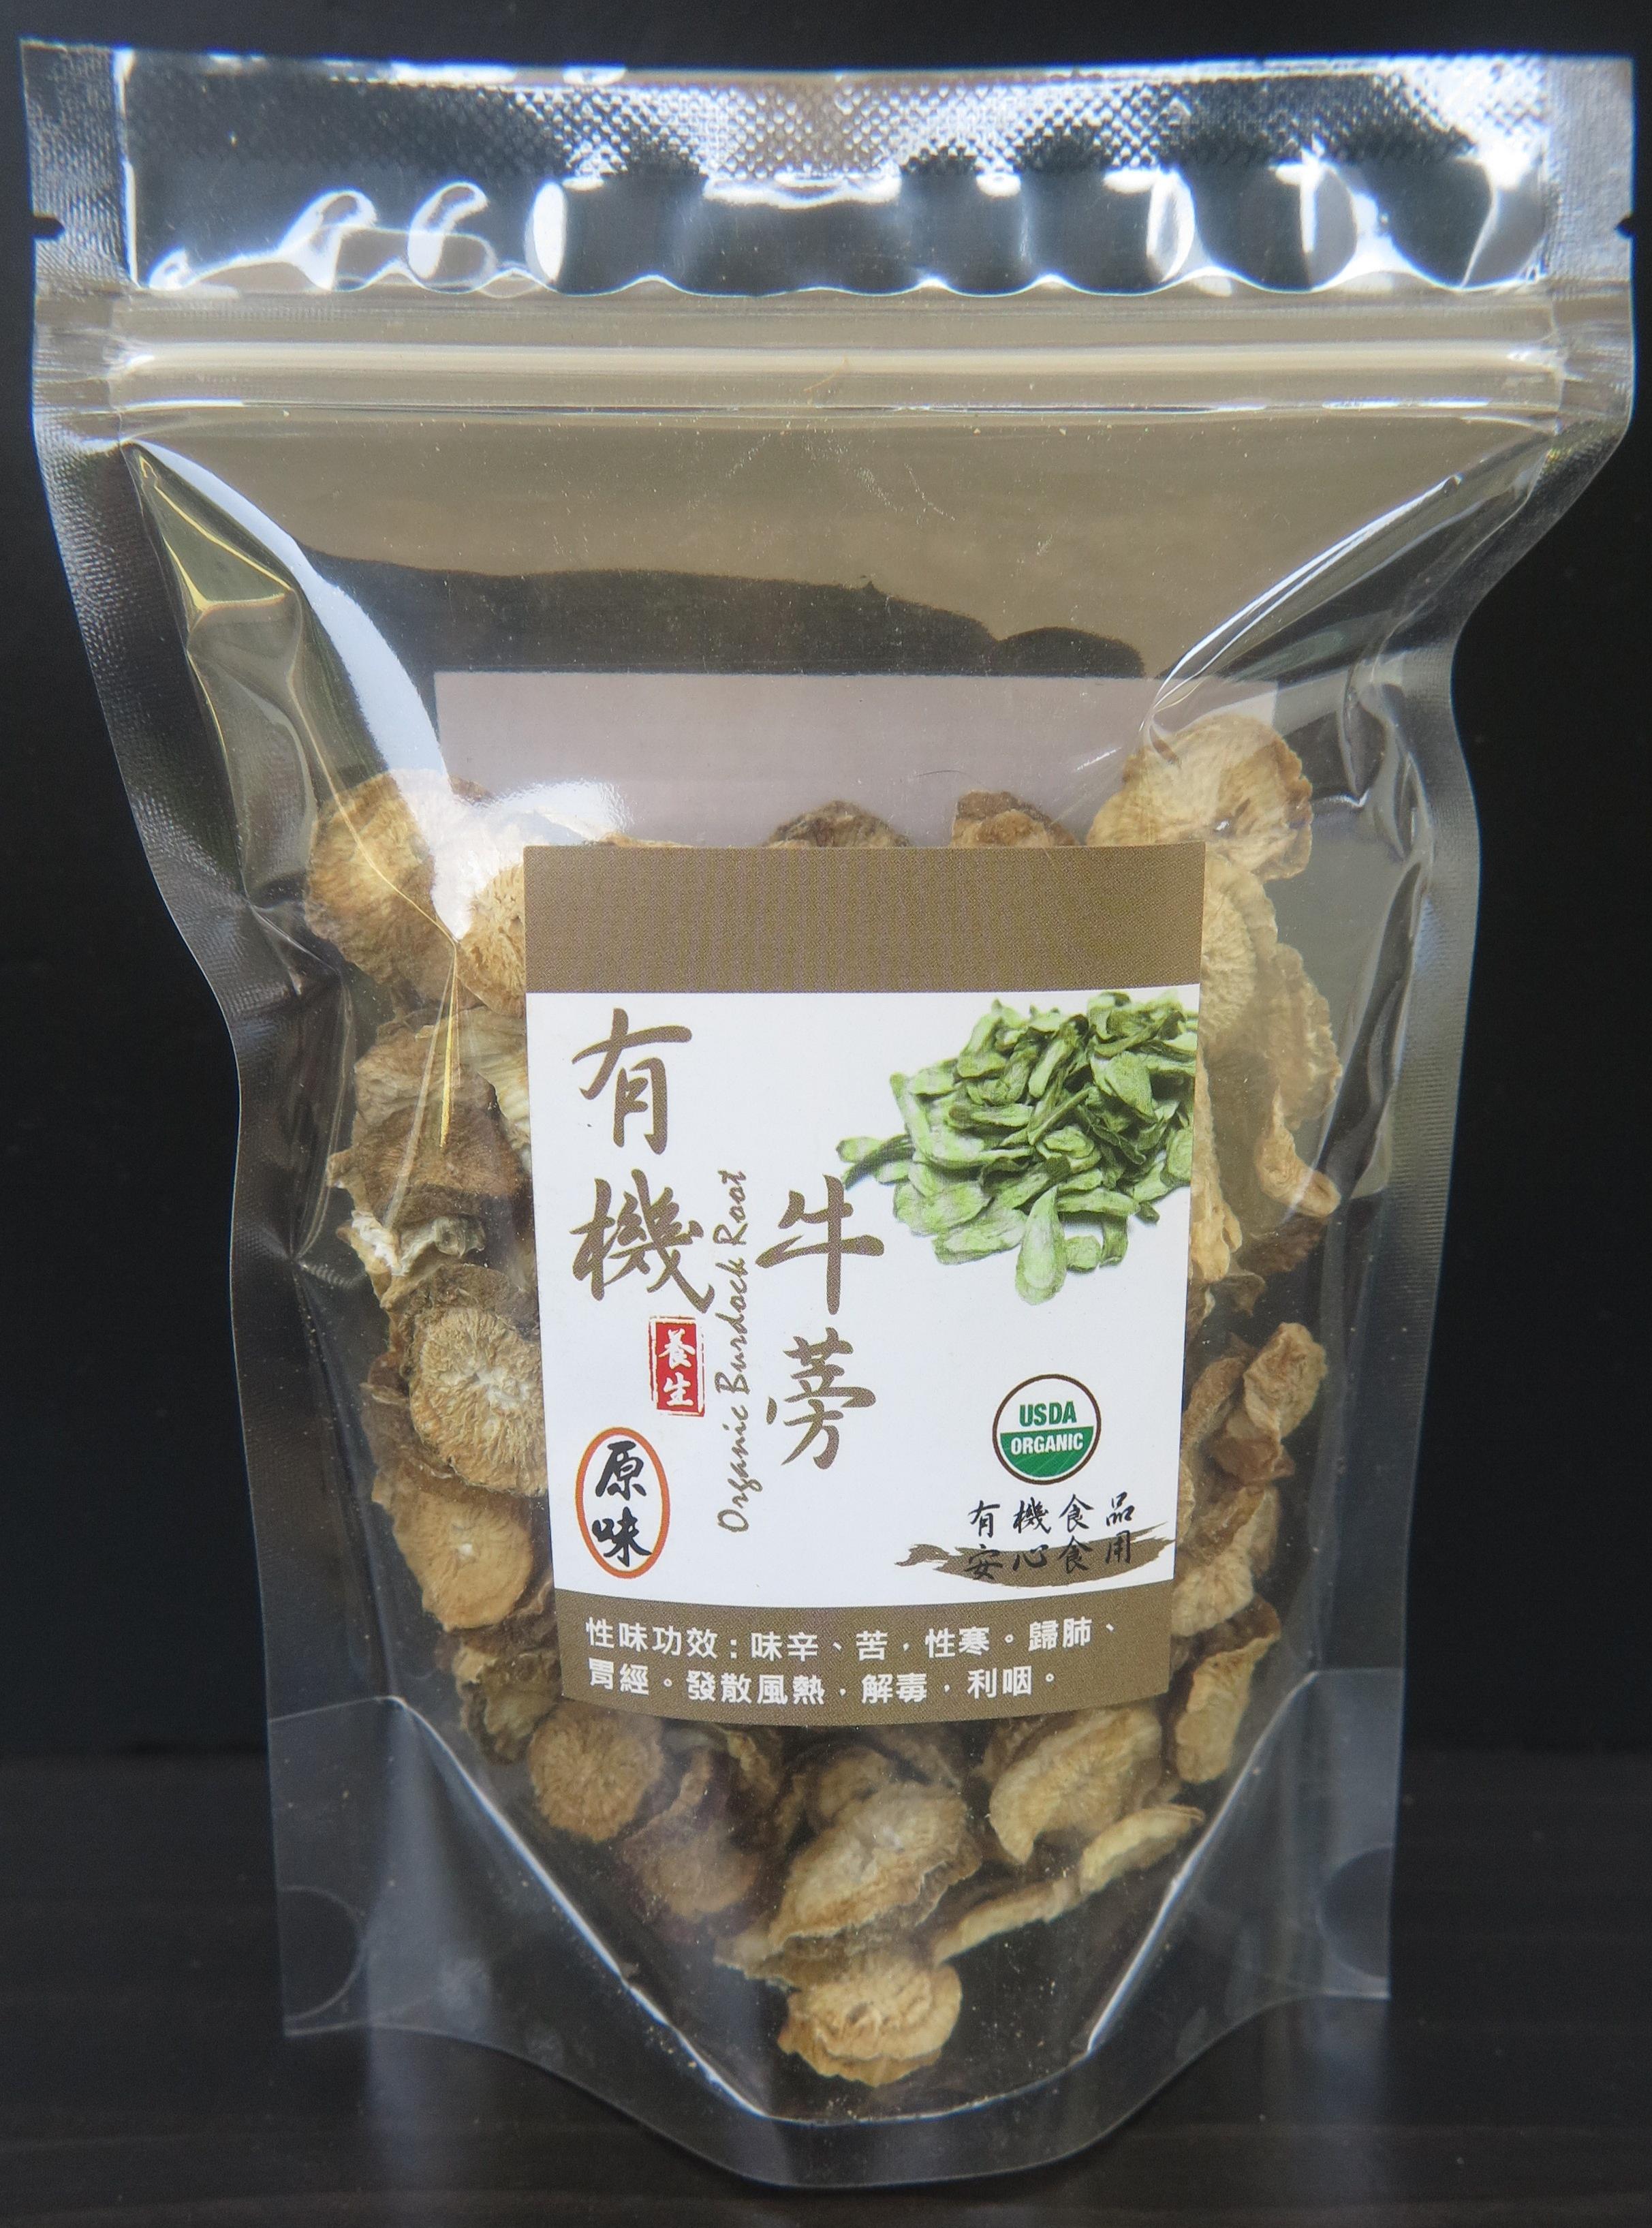 有機牛蒡 Organic Burdock Root